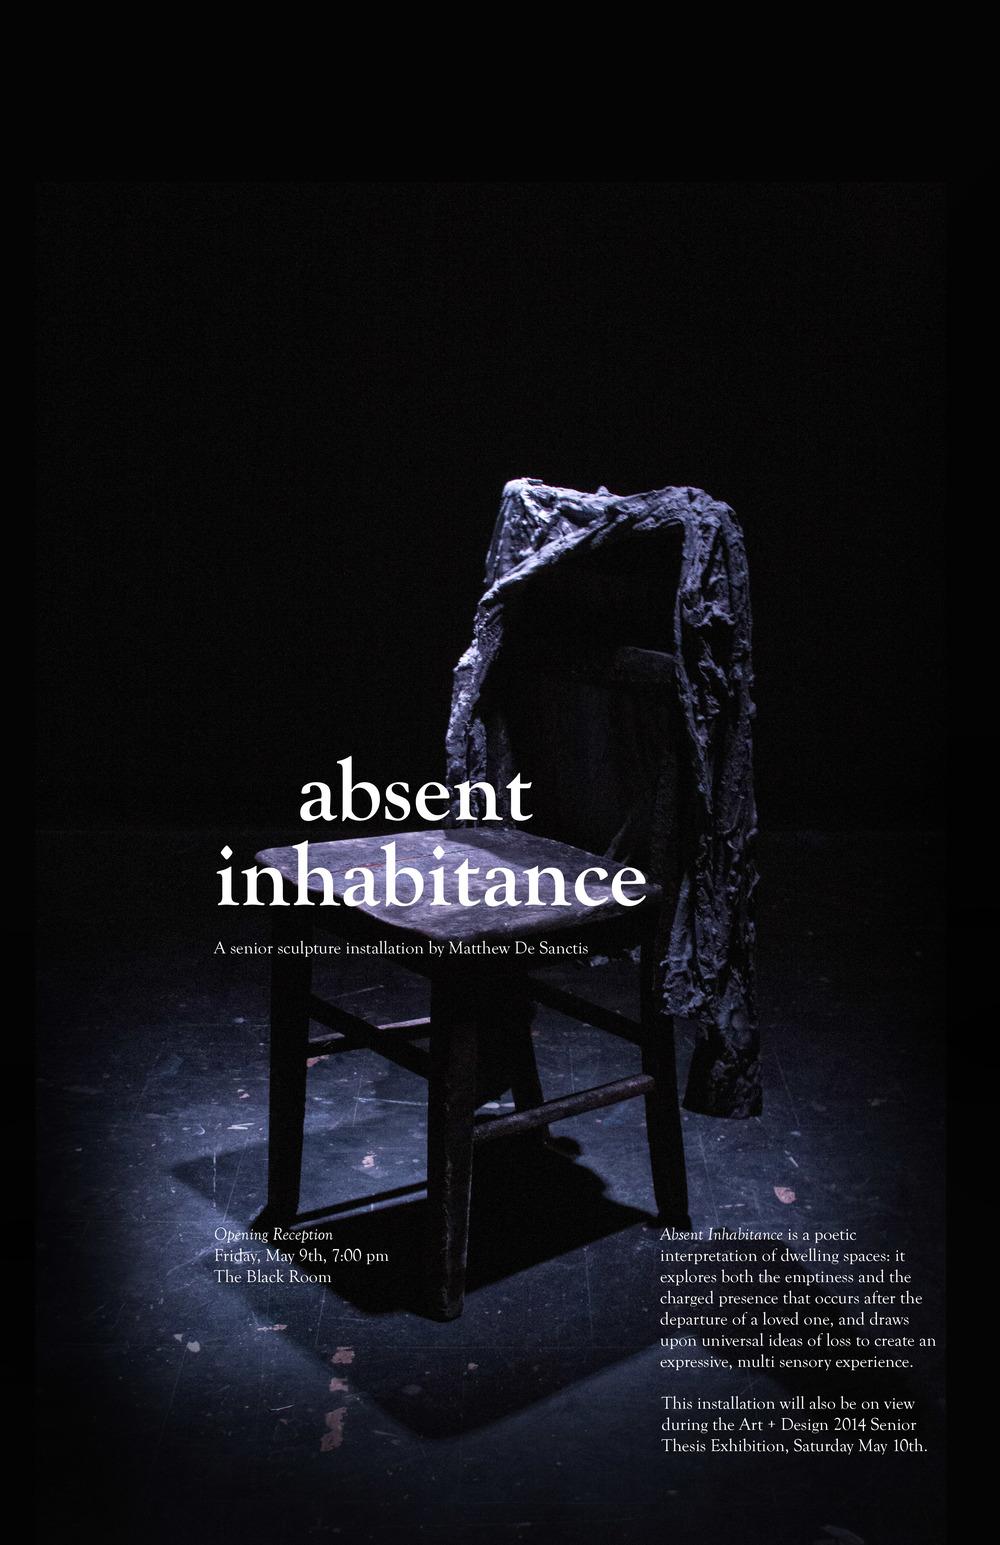 Absent Inhabitance Poster, 2014